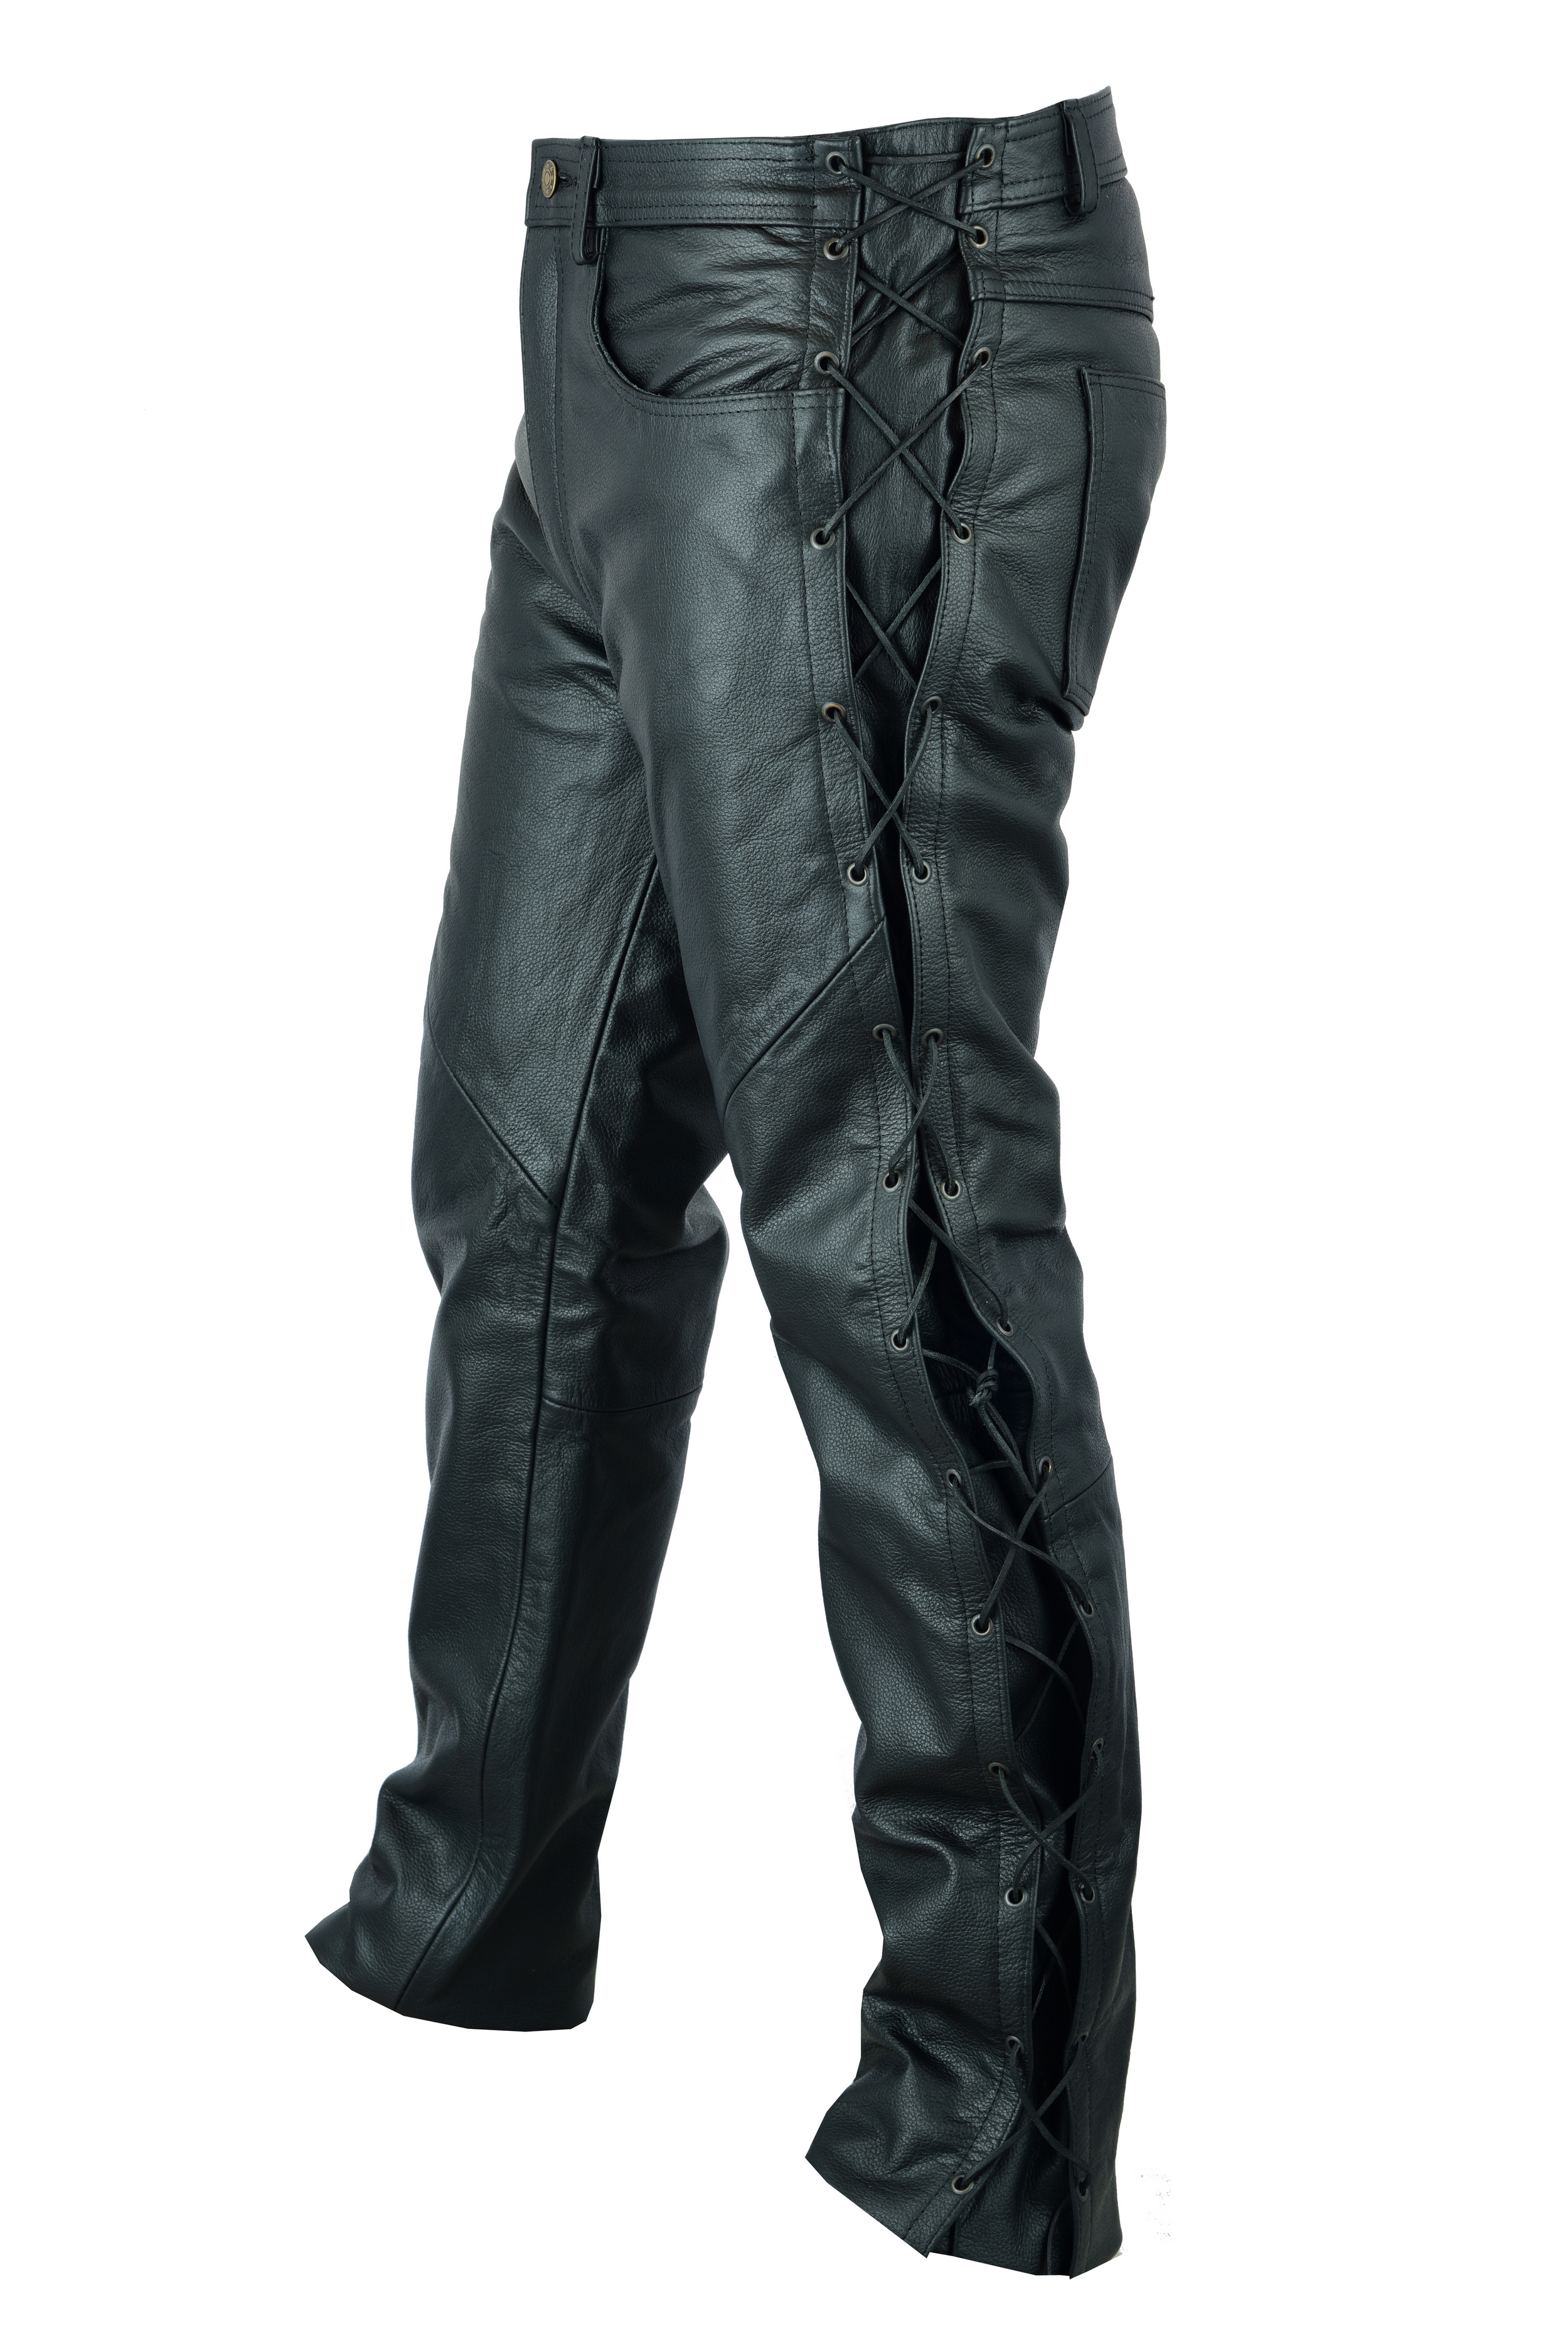 Leather MOTORCYCLE TROUSERS Mens Cowhide Biker Pants Black Lace Motorbike Jeans